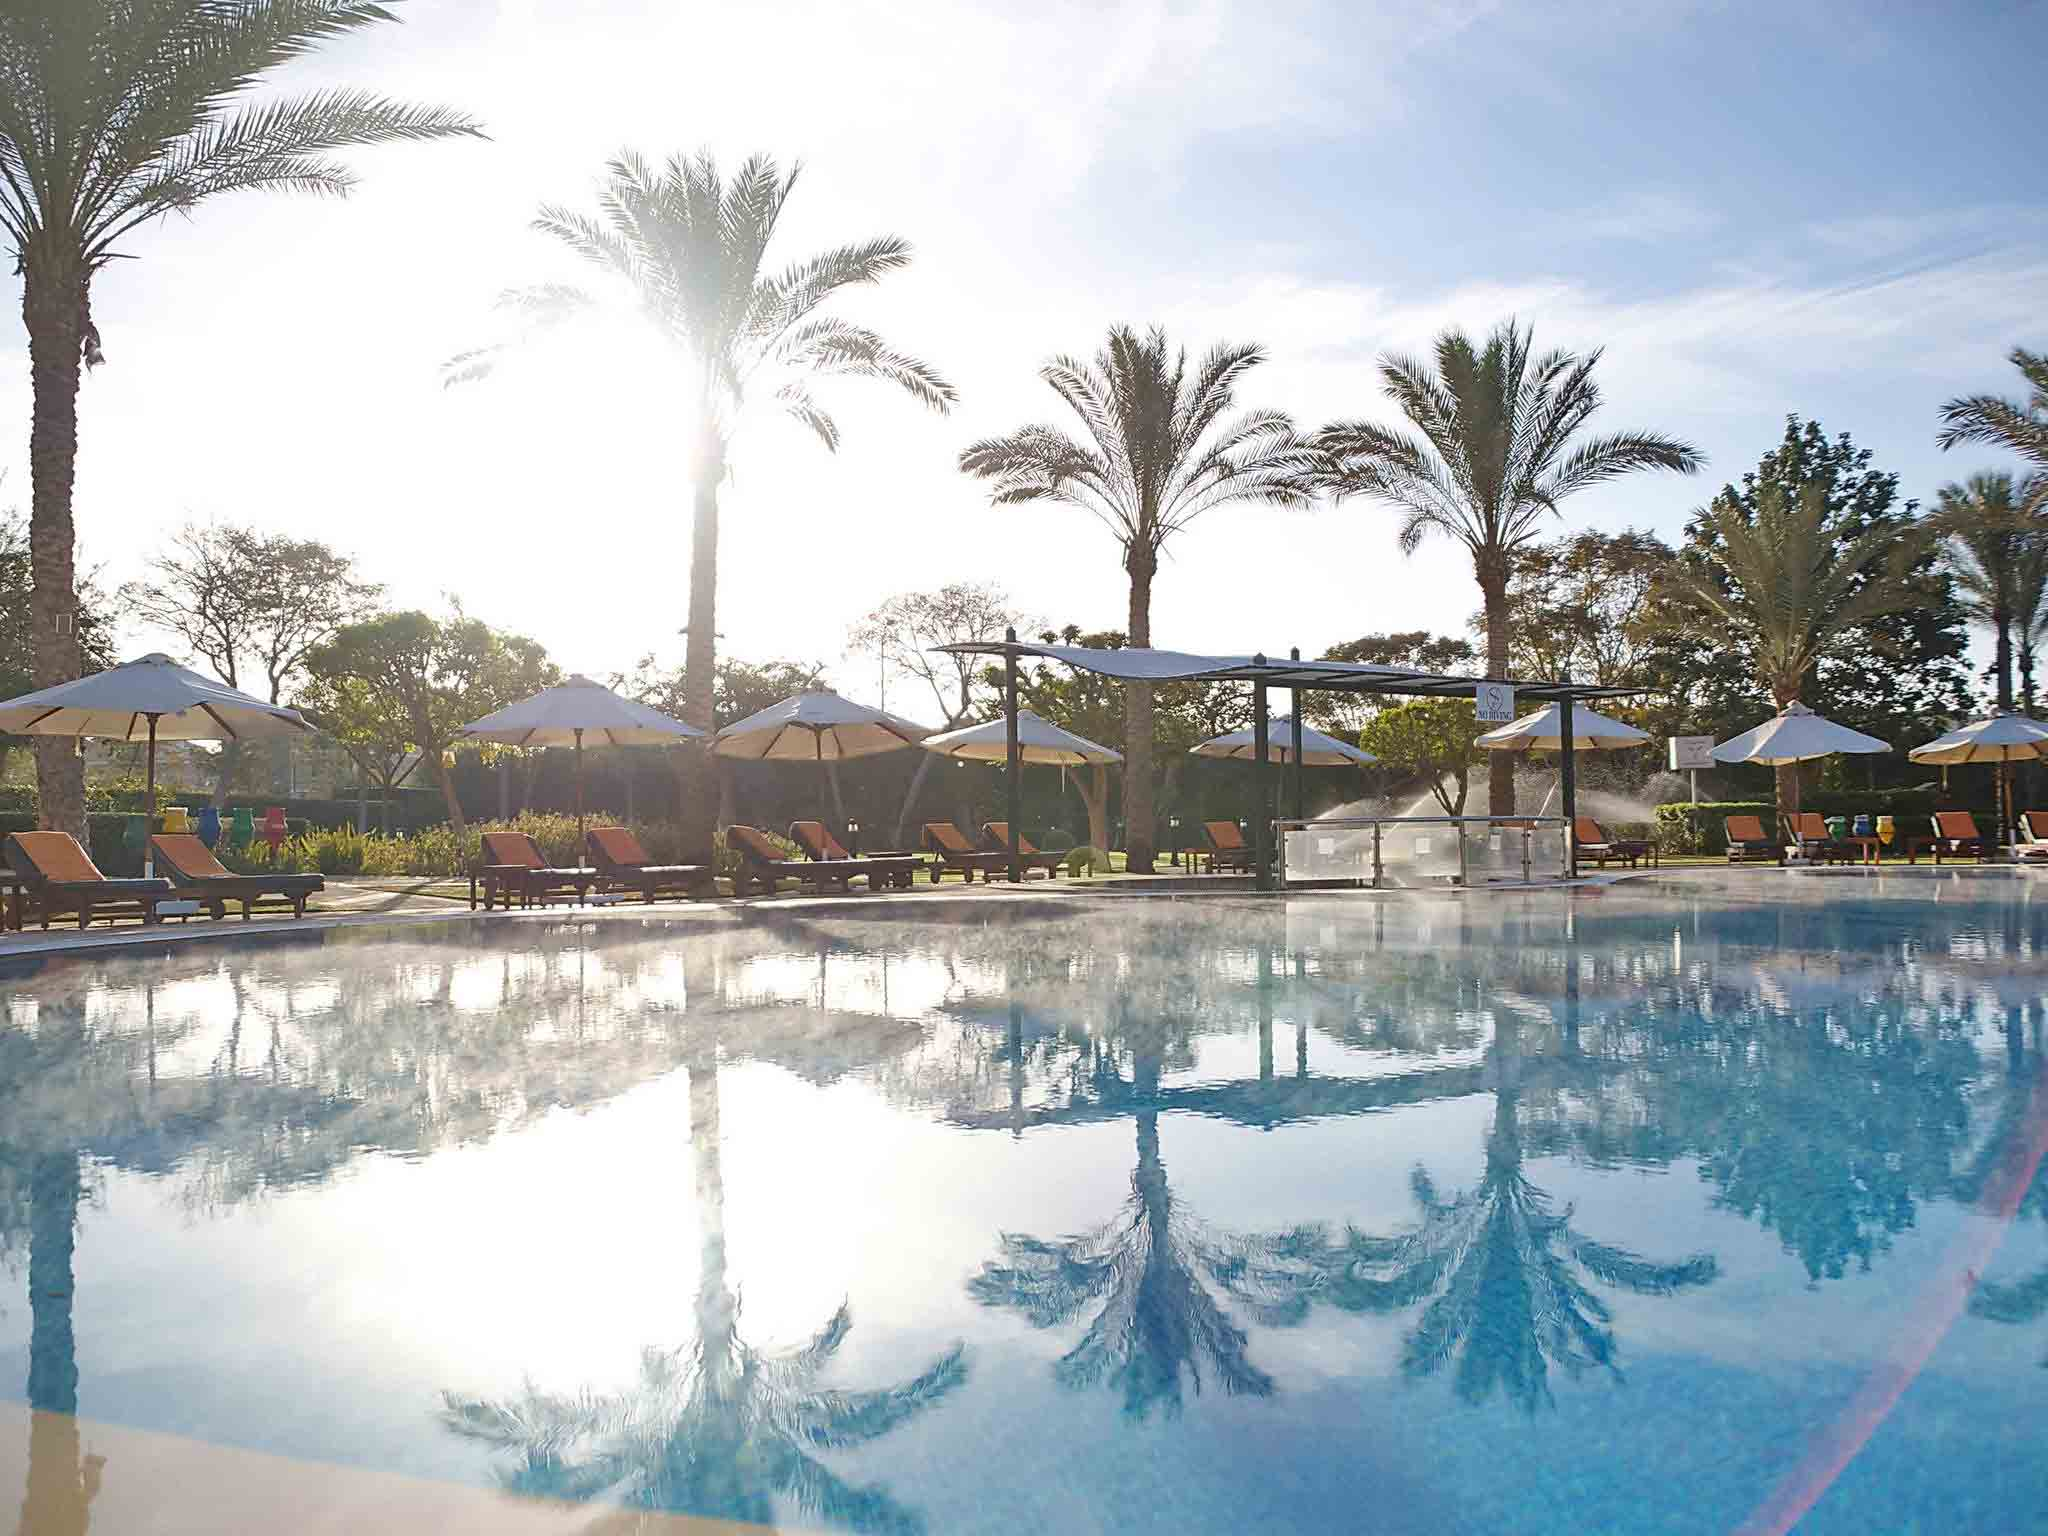 Hotel - Novotel Cairo 6th of October